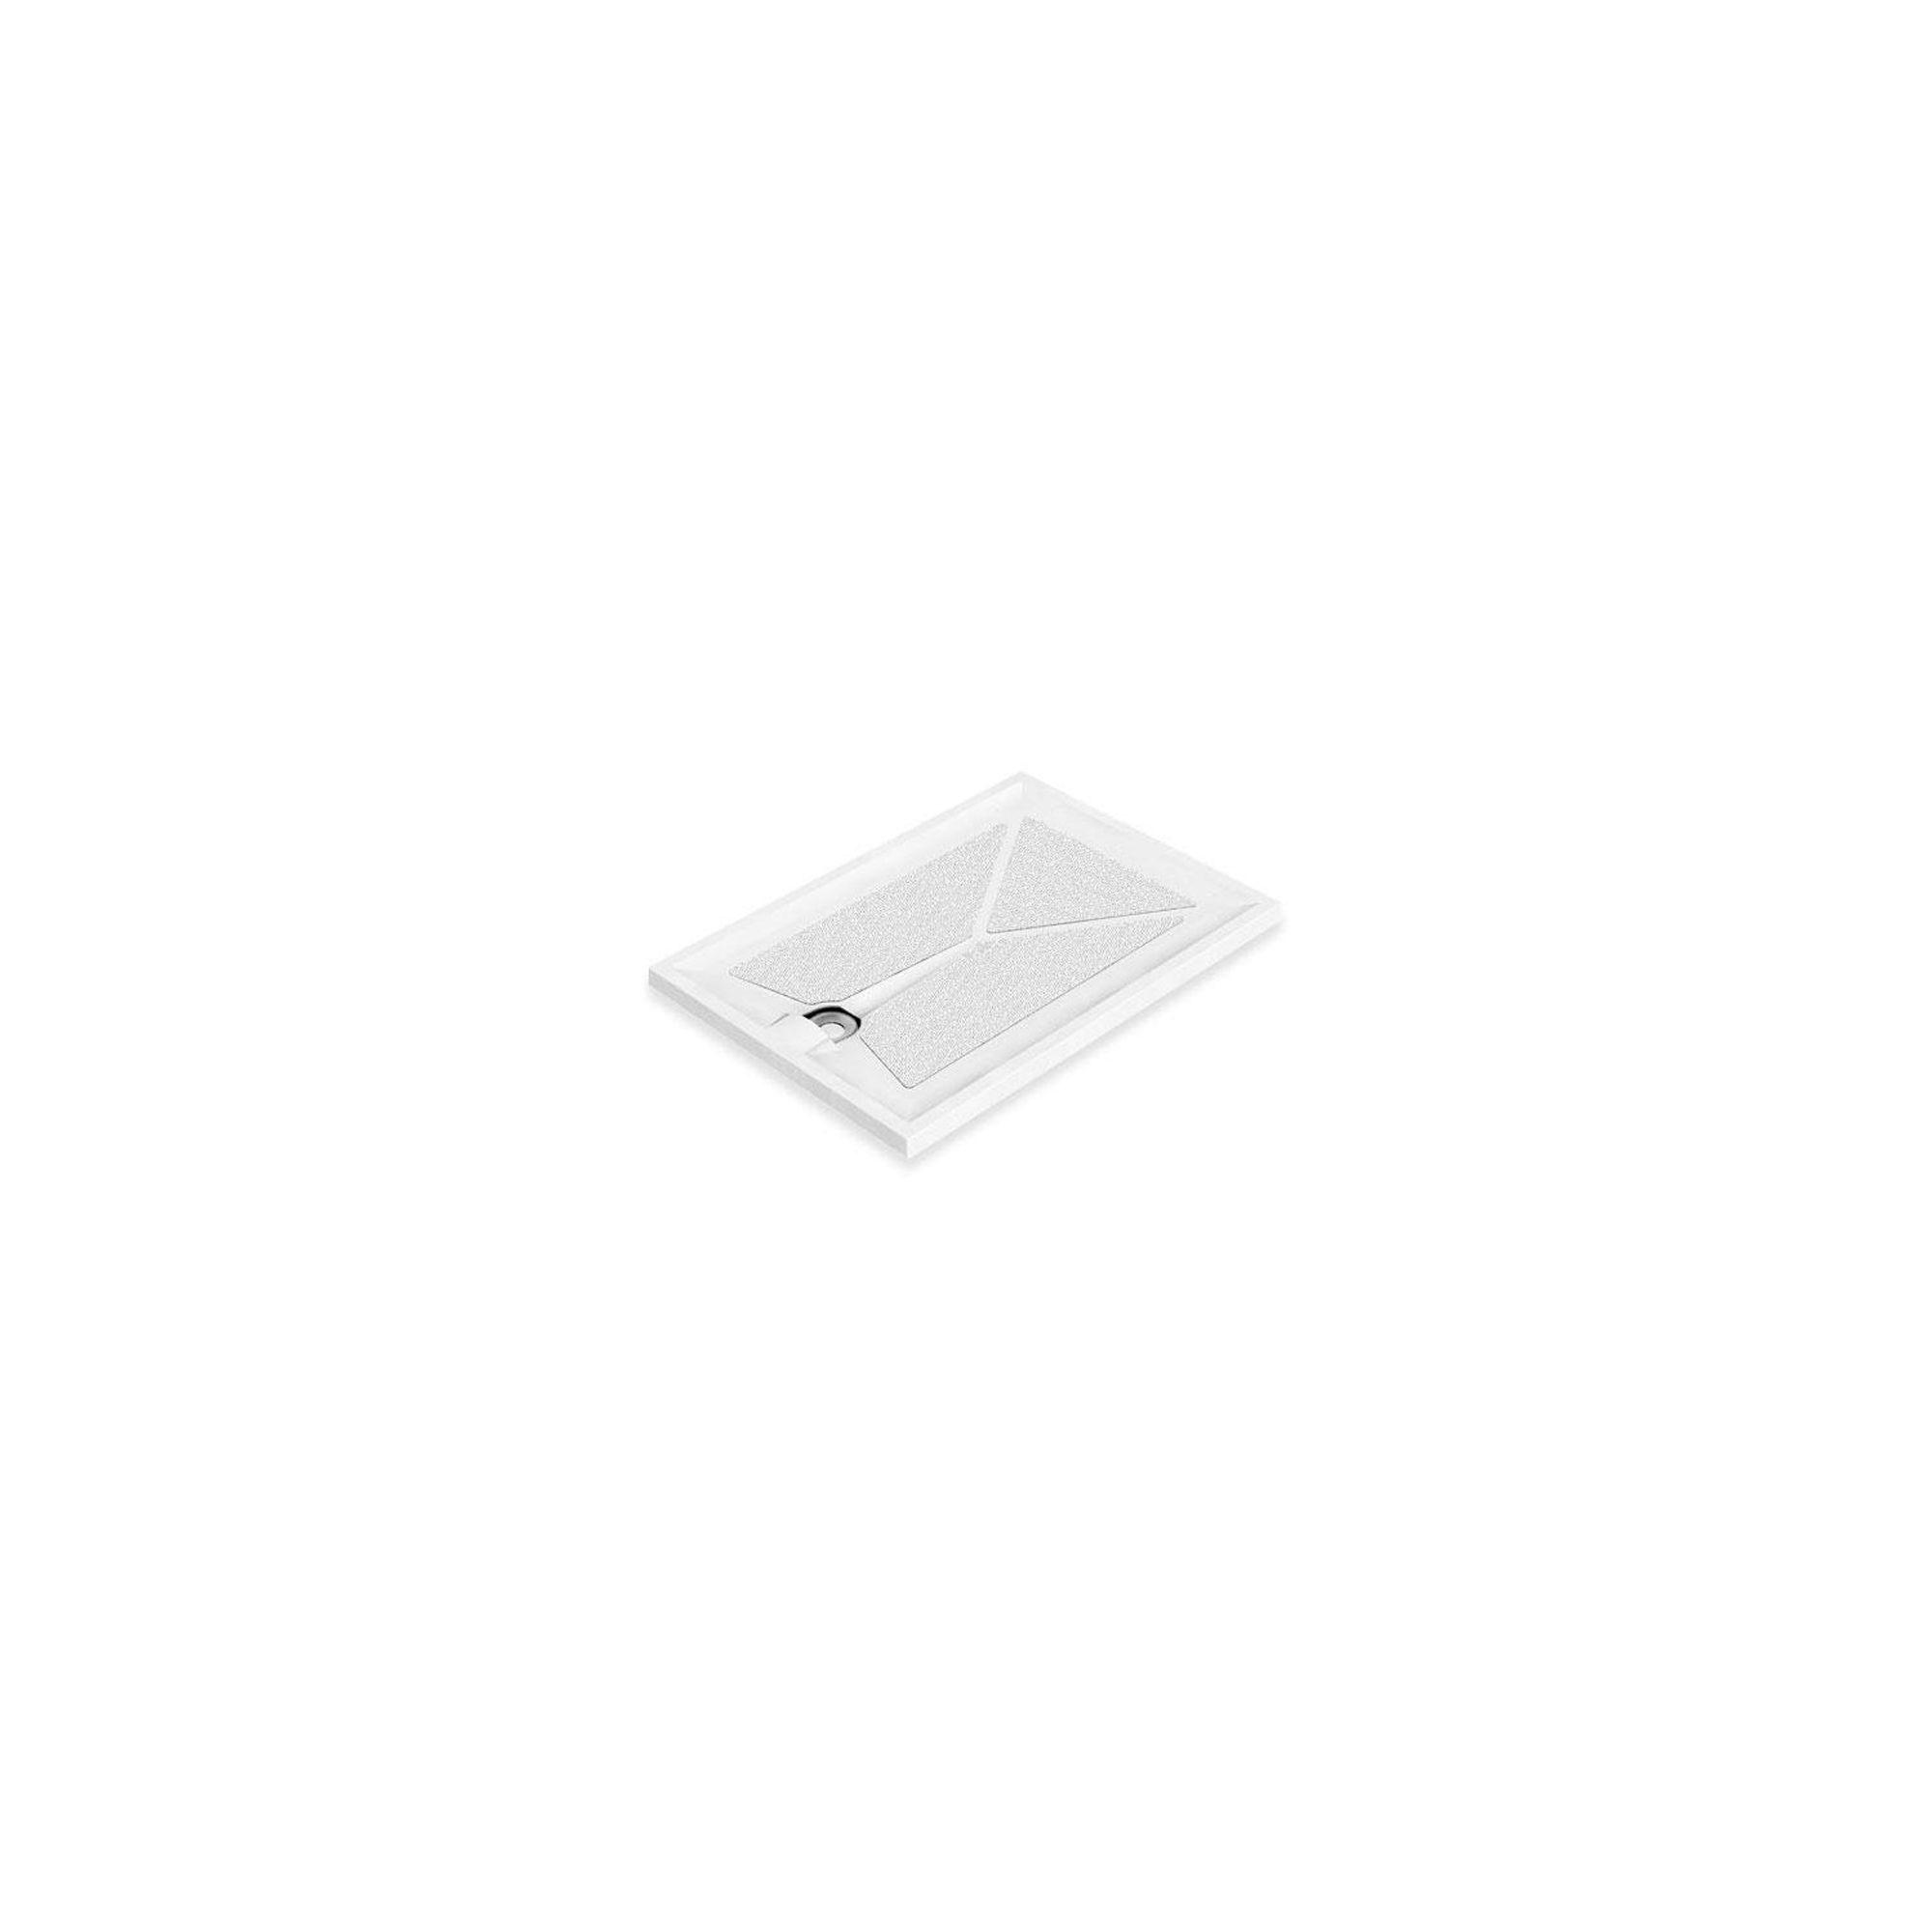 AKW Braddan Rectangular Shower Tray 1000mm x 700mm at Tesco Direct